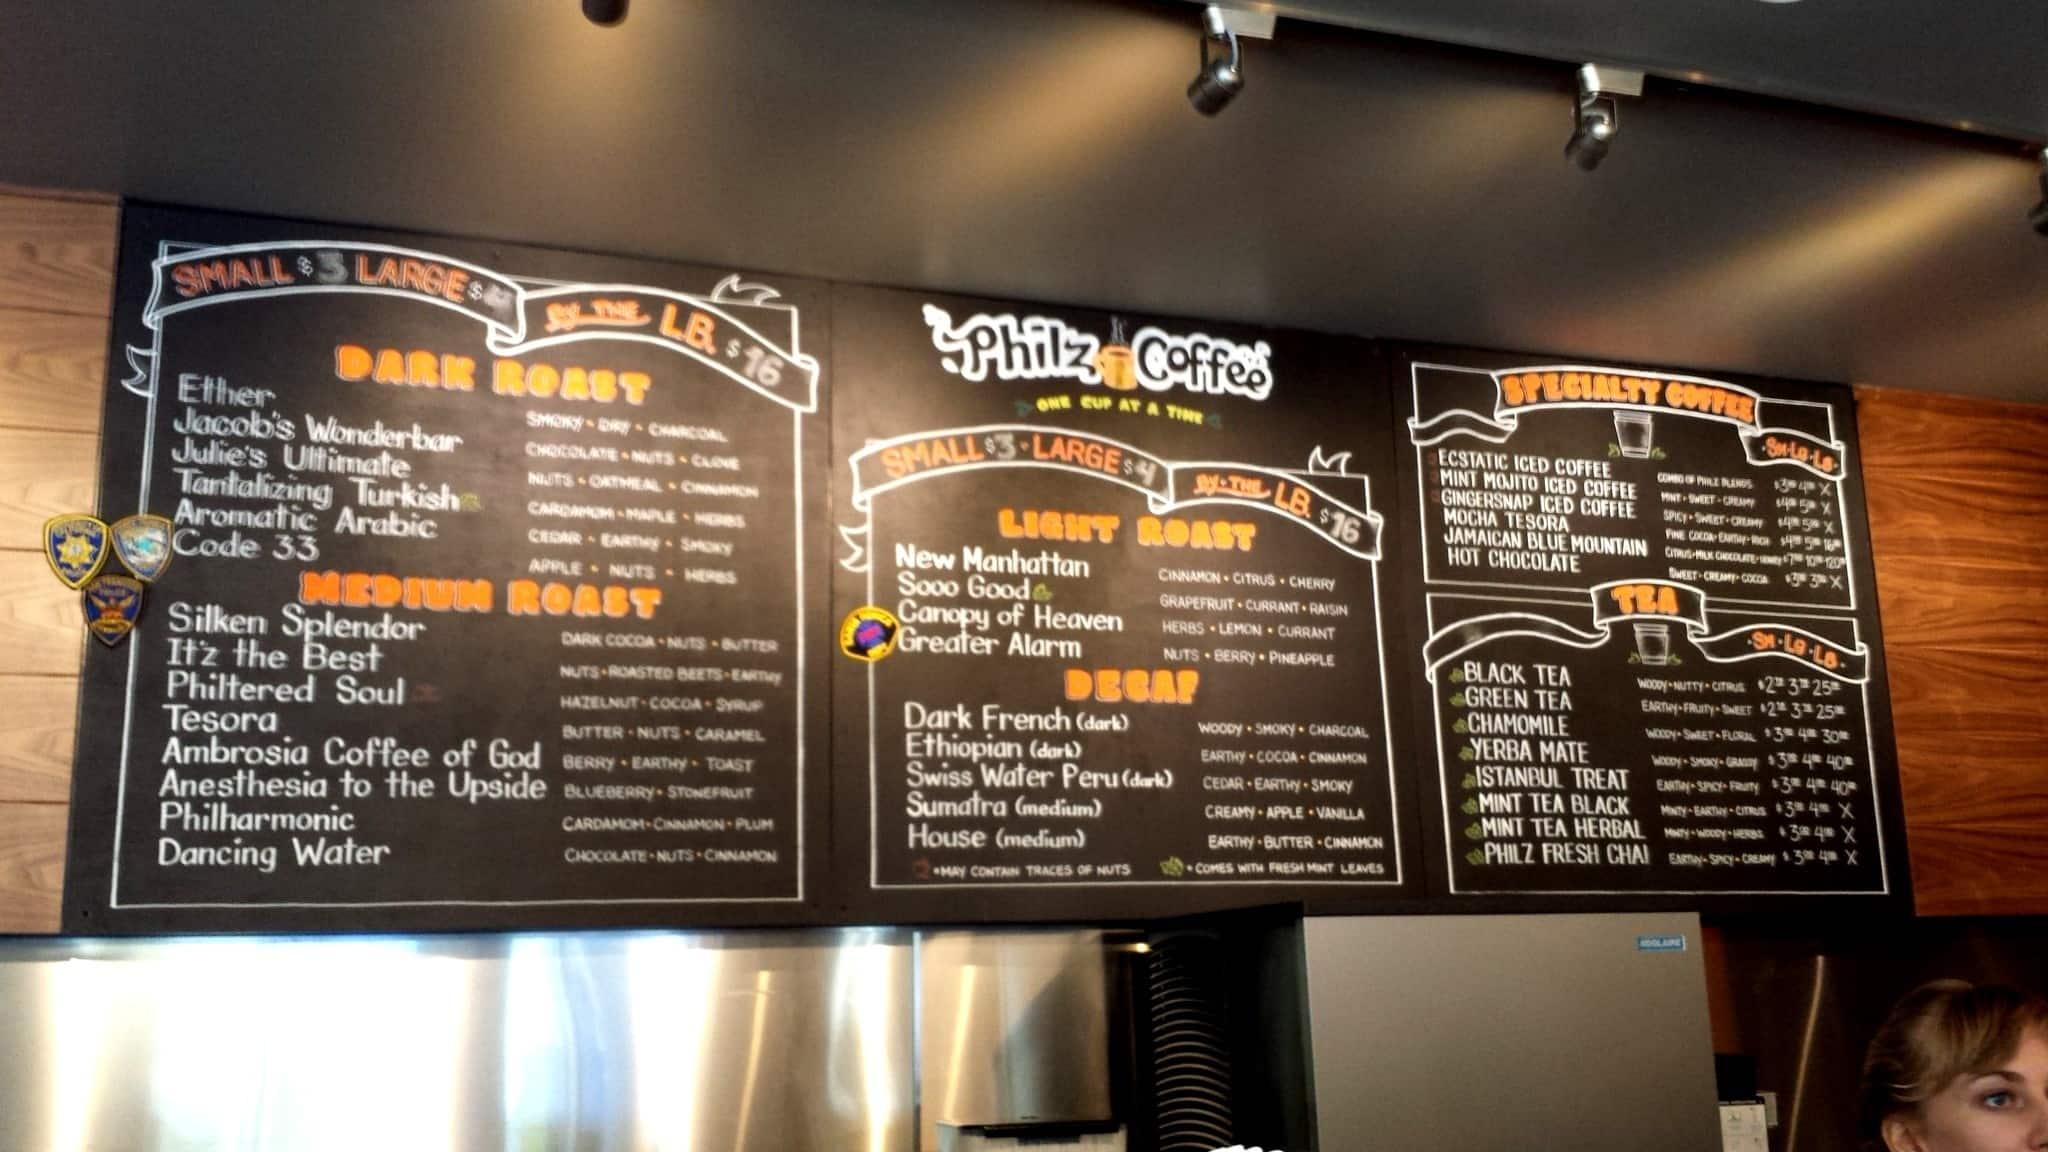 philz coffee menu, menu for philz coffee, downtown third street